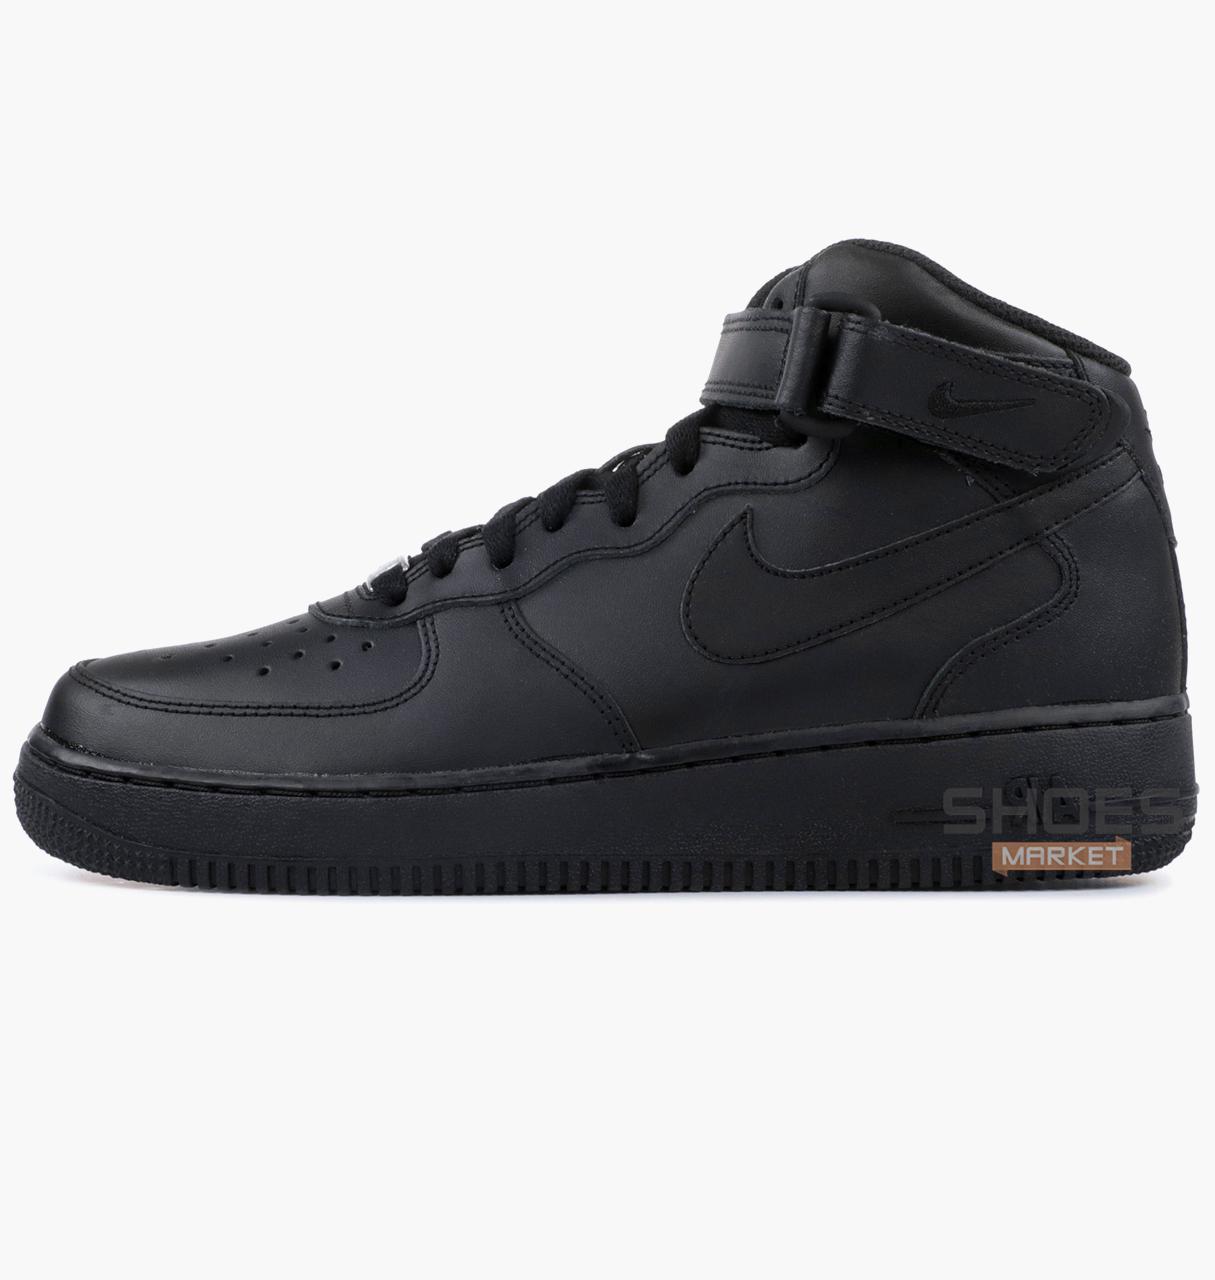 1e77e98b Женские кроссовки Nike Air Force 1 Mid (GS) Black 314195-004, оригинал